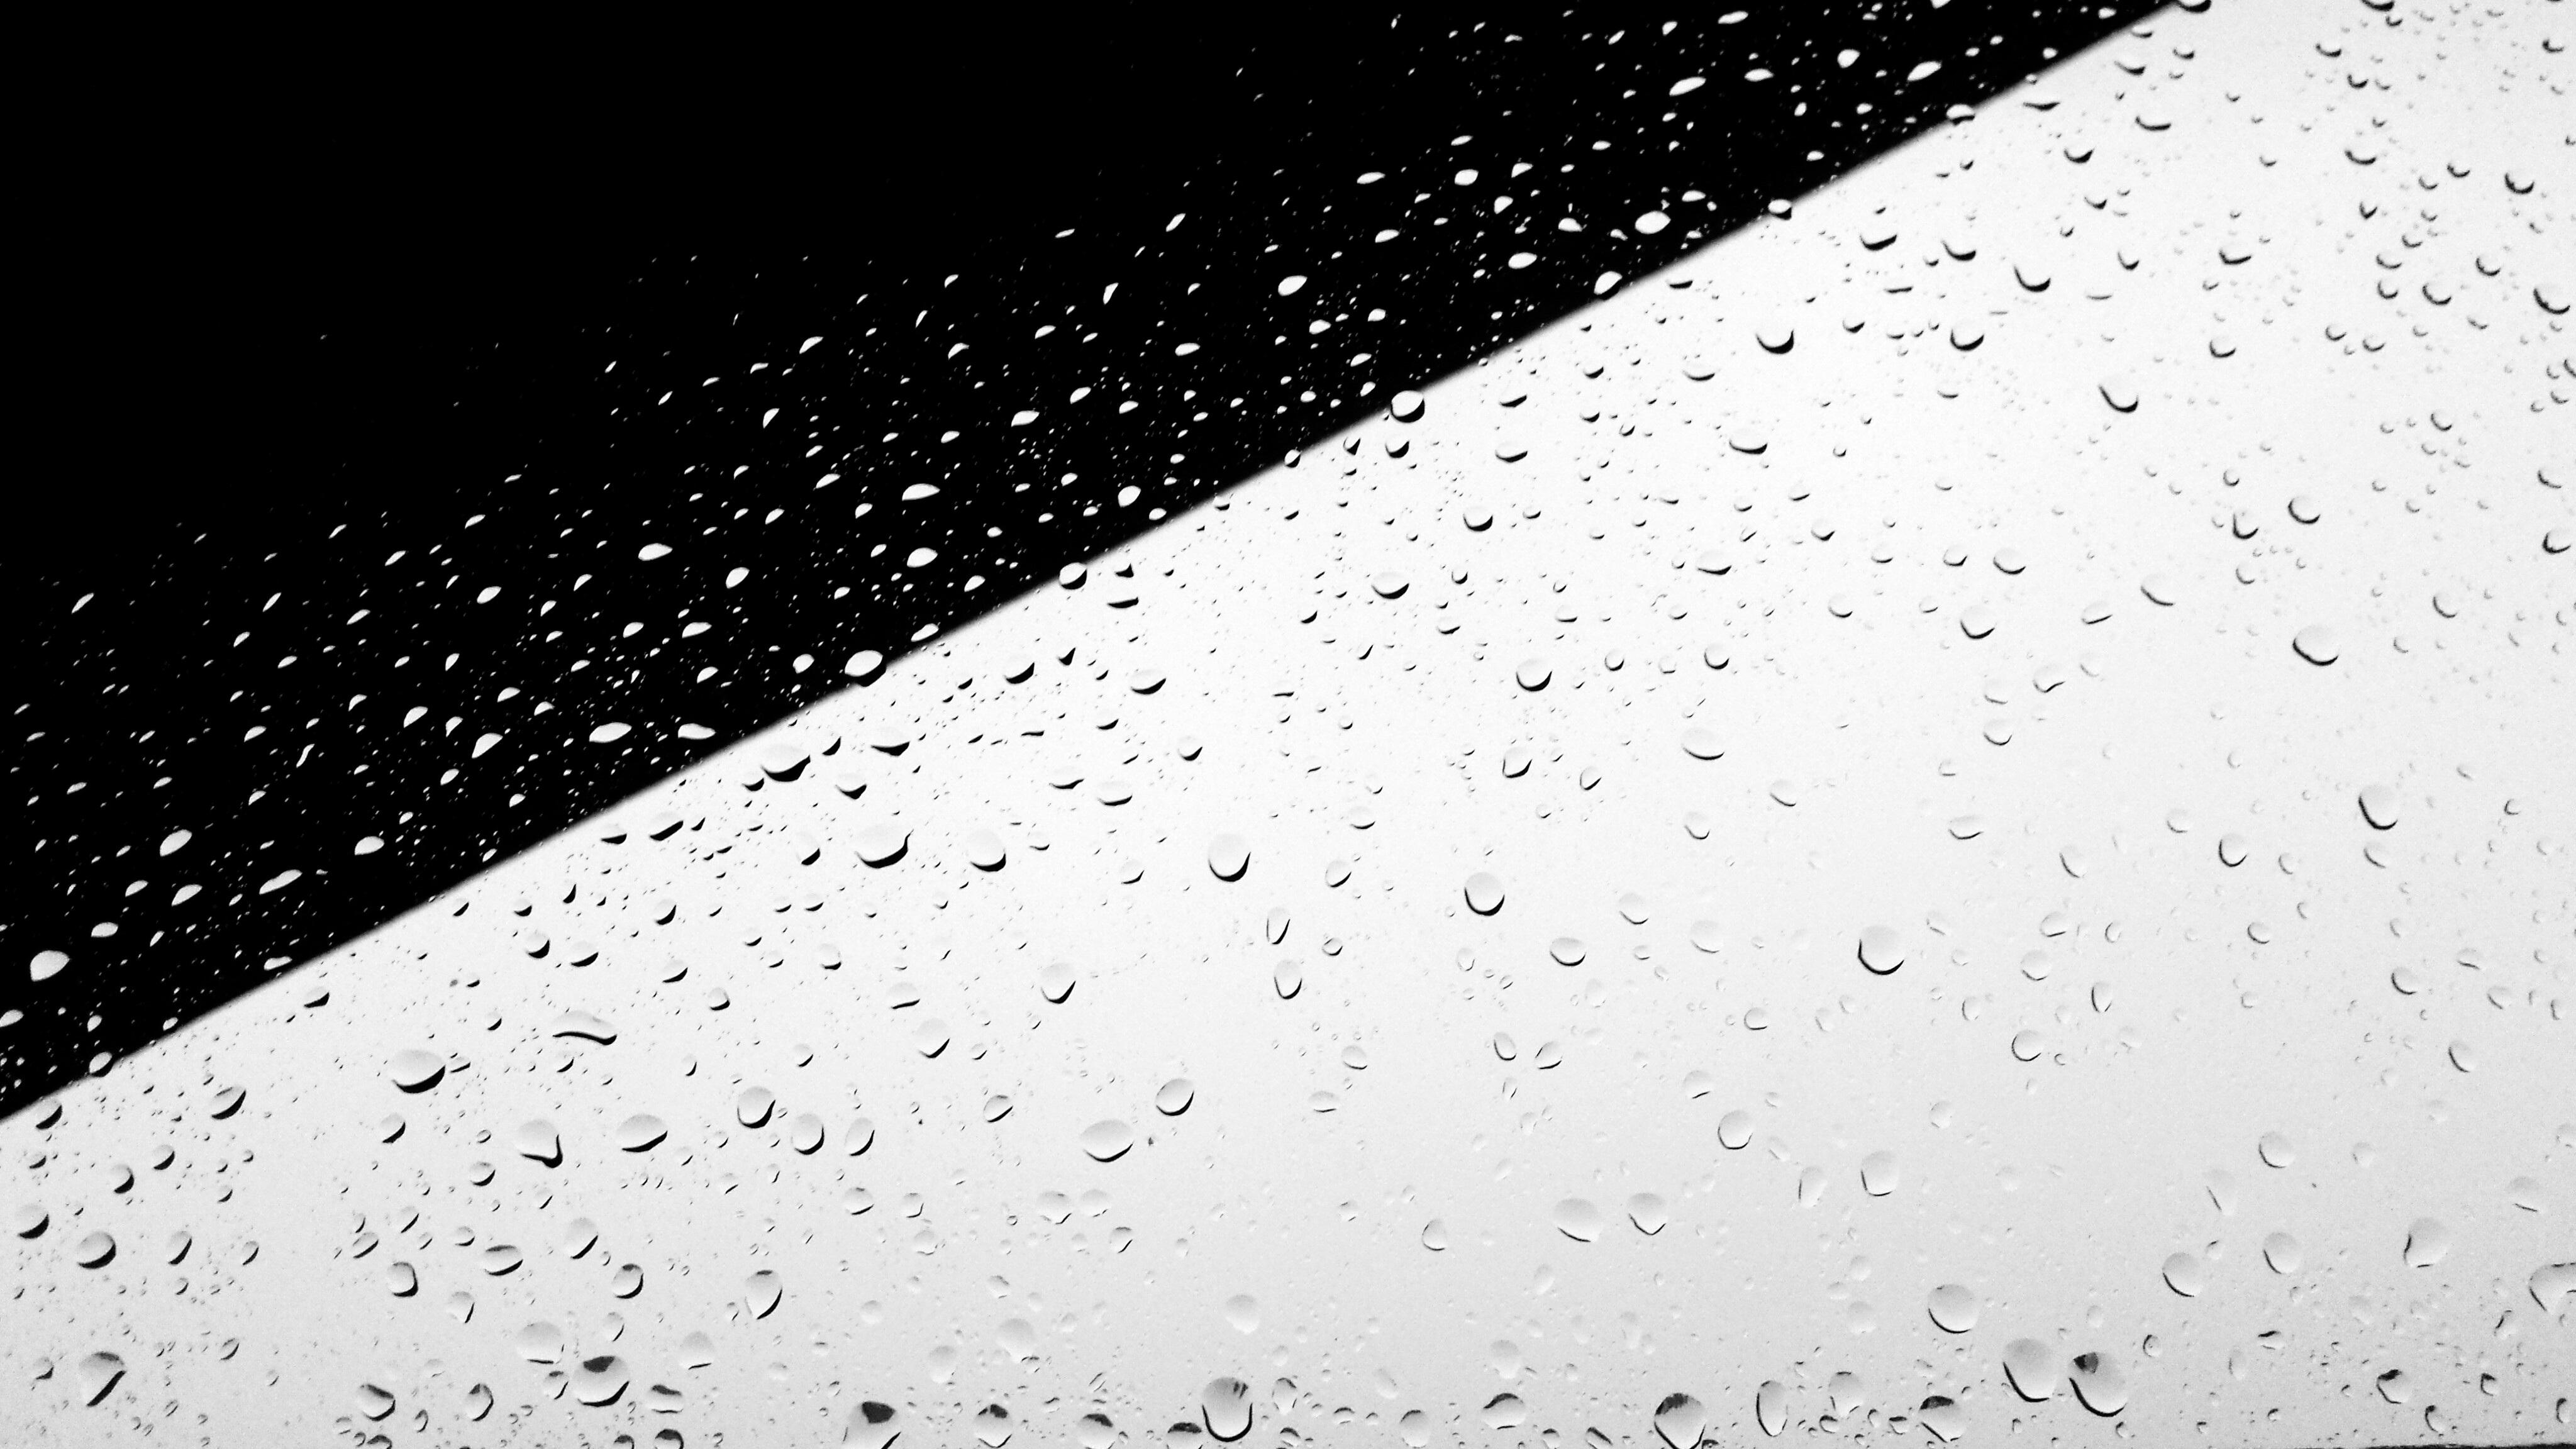 Black White Minimal Minimalist Minimalistic Rain Raindrops Rainy